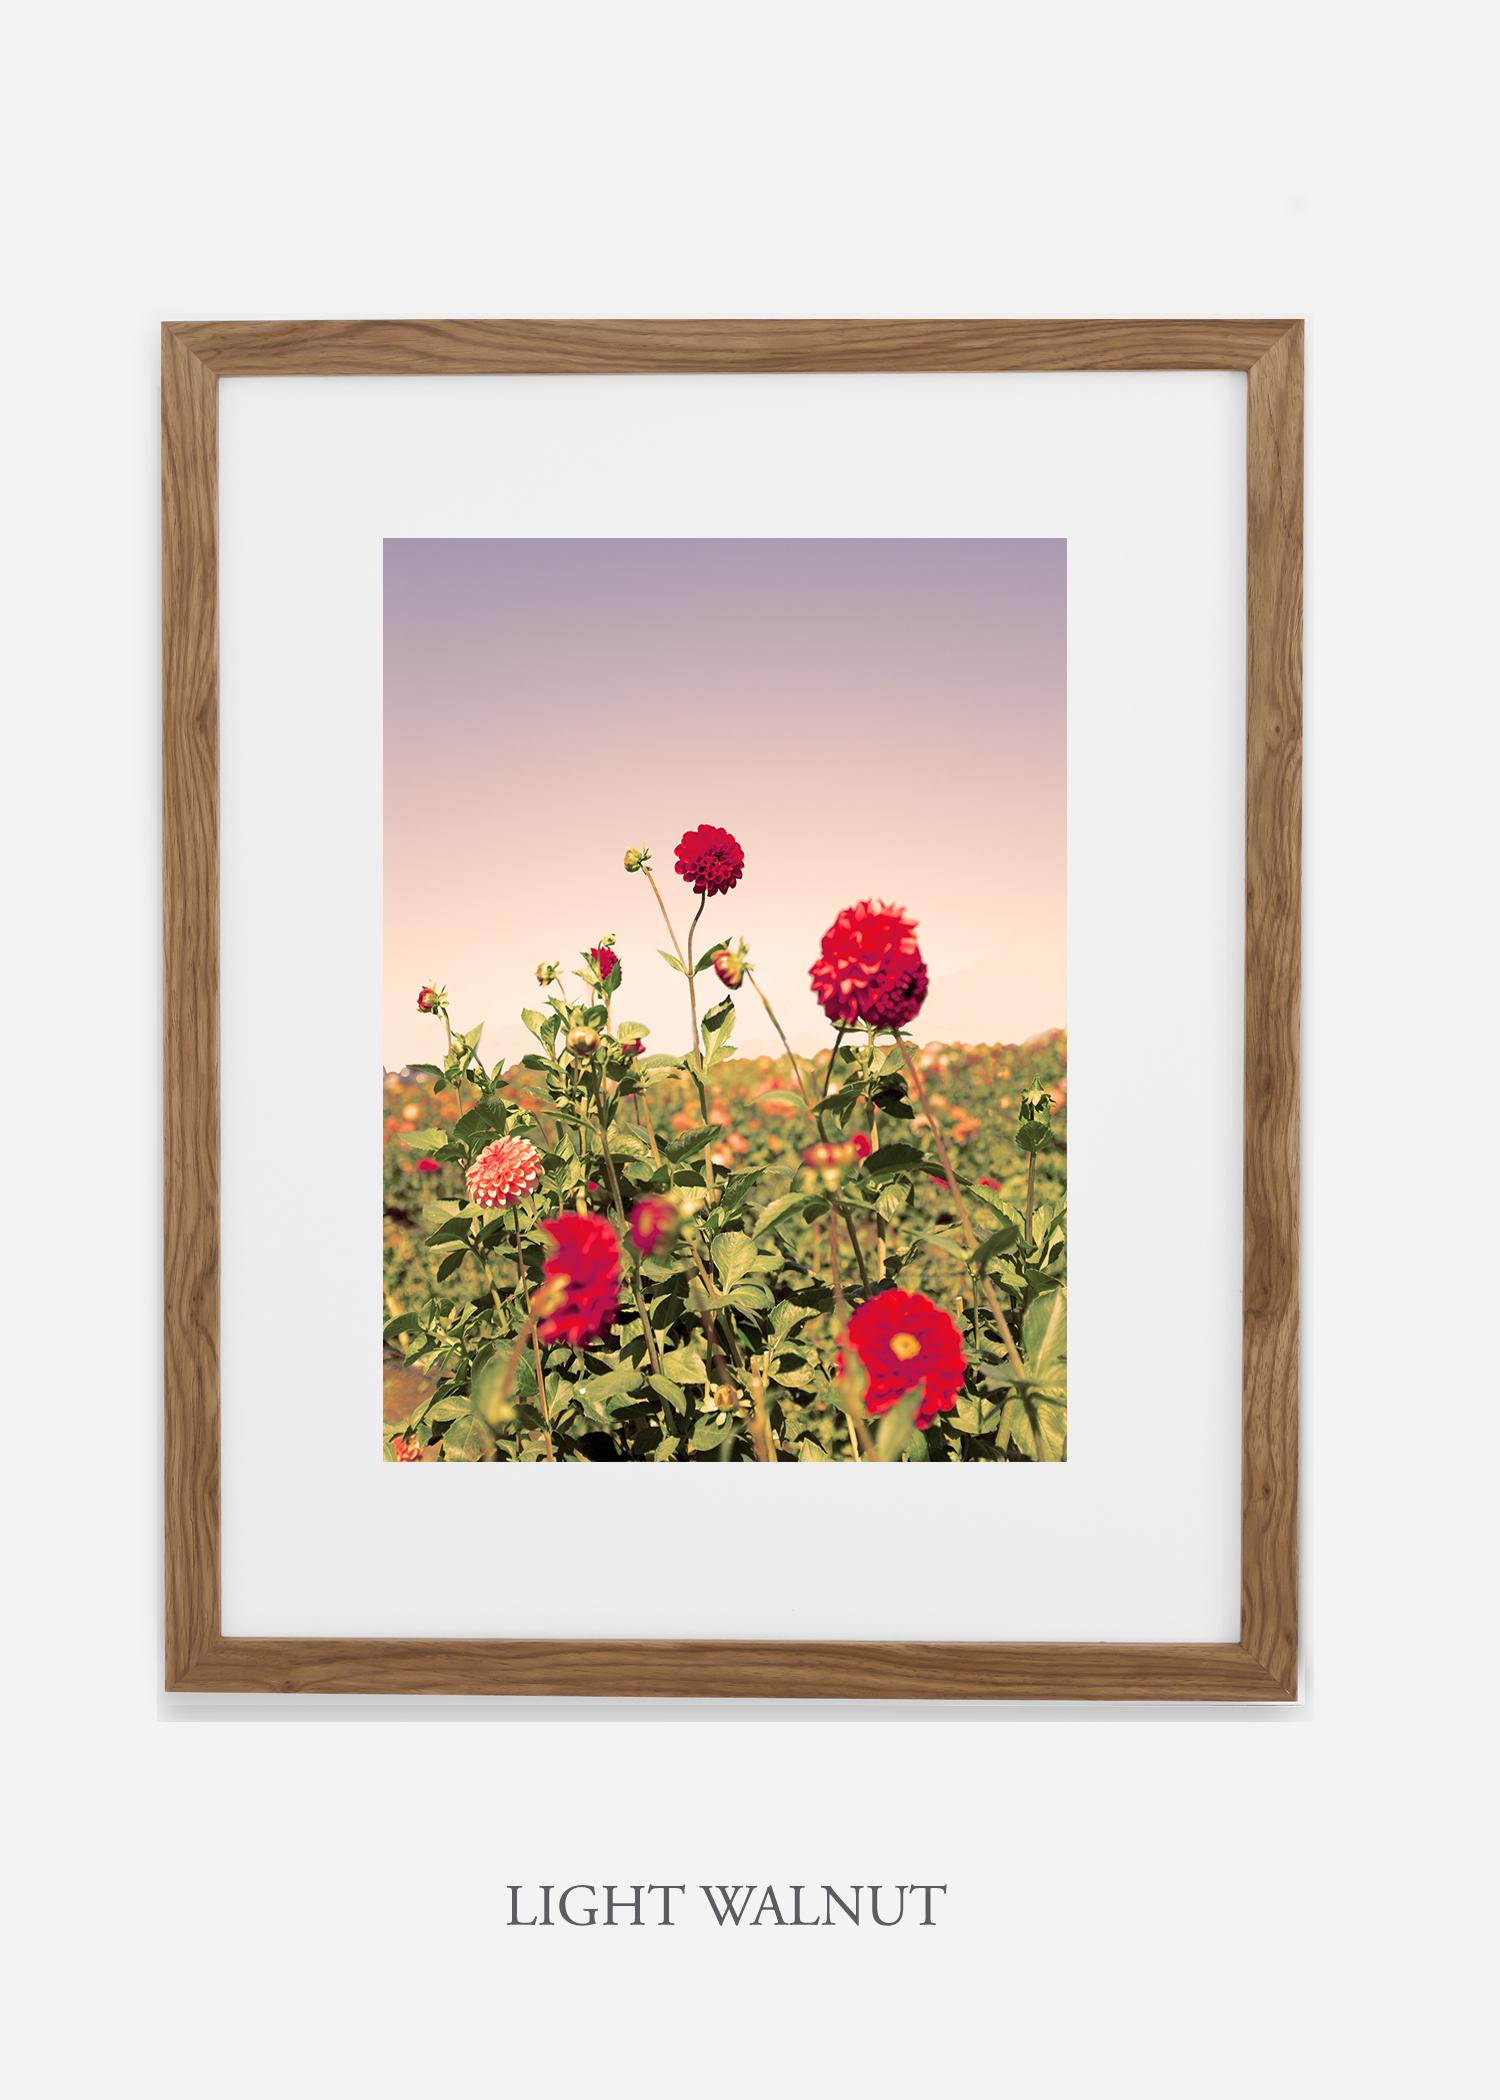 DahliaNo.8-light-walnut-frame-mat-interior-design-botanical-print-art-wilder-california-wilder-paper.jpg